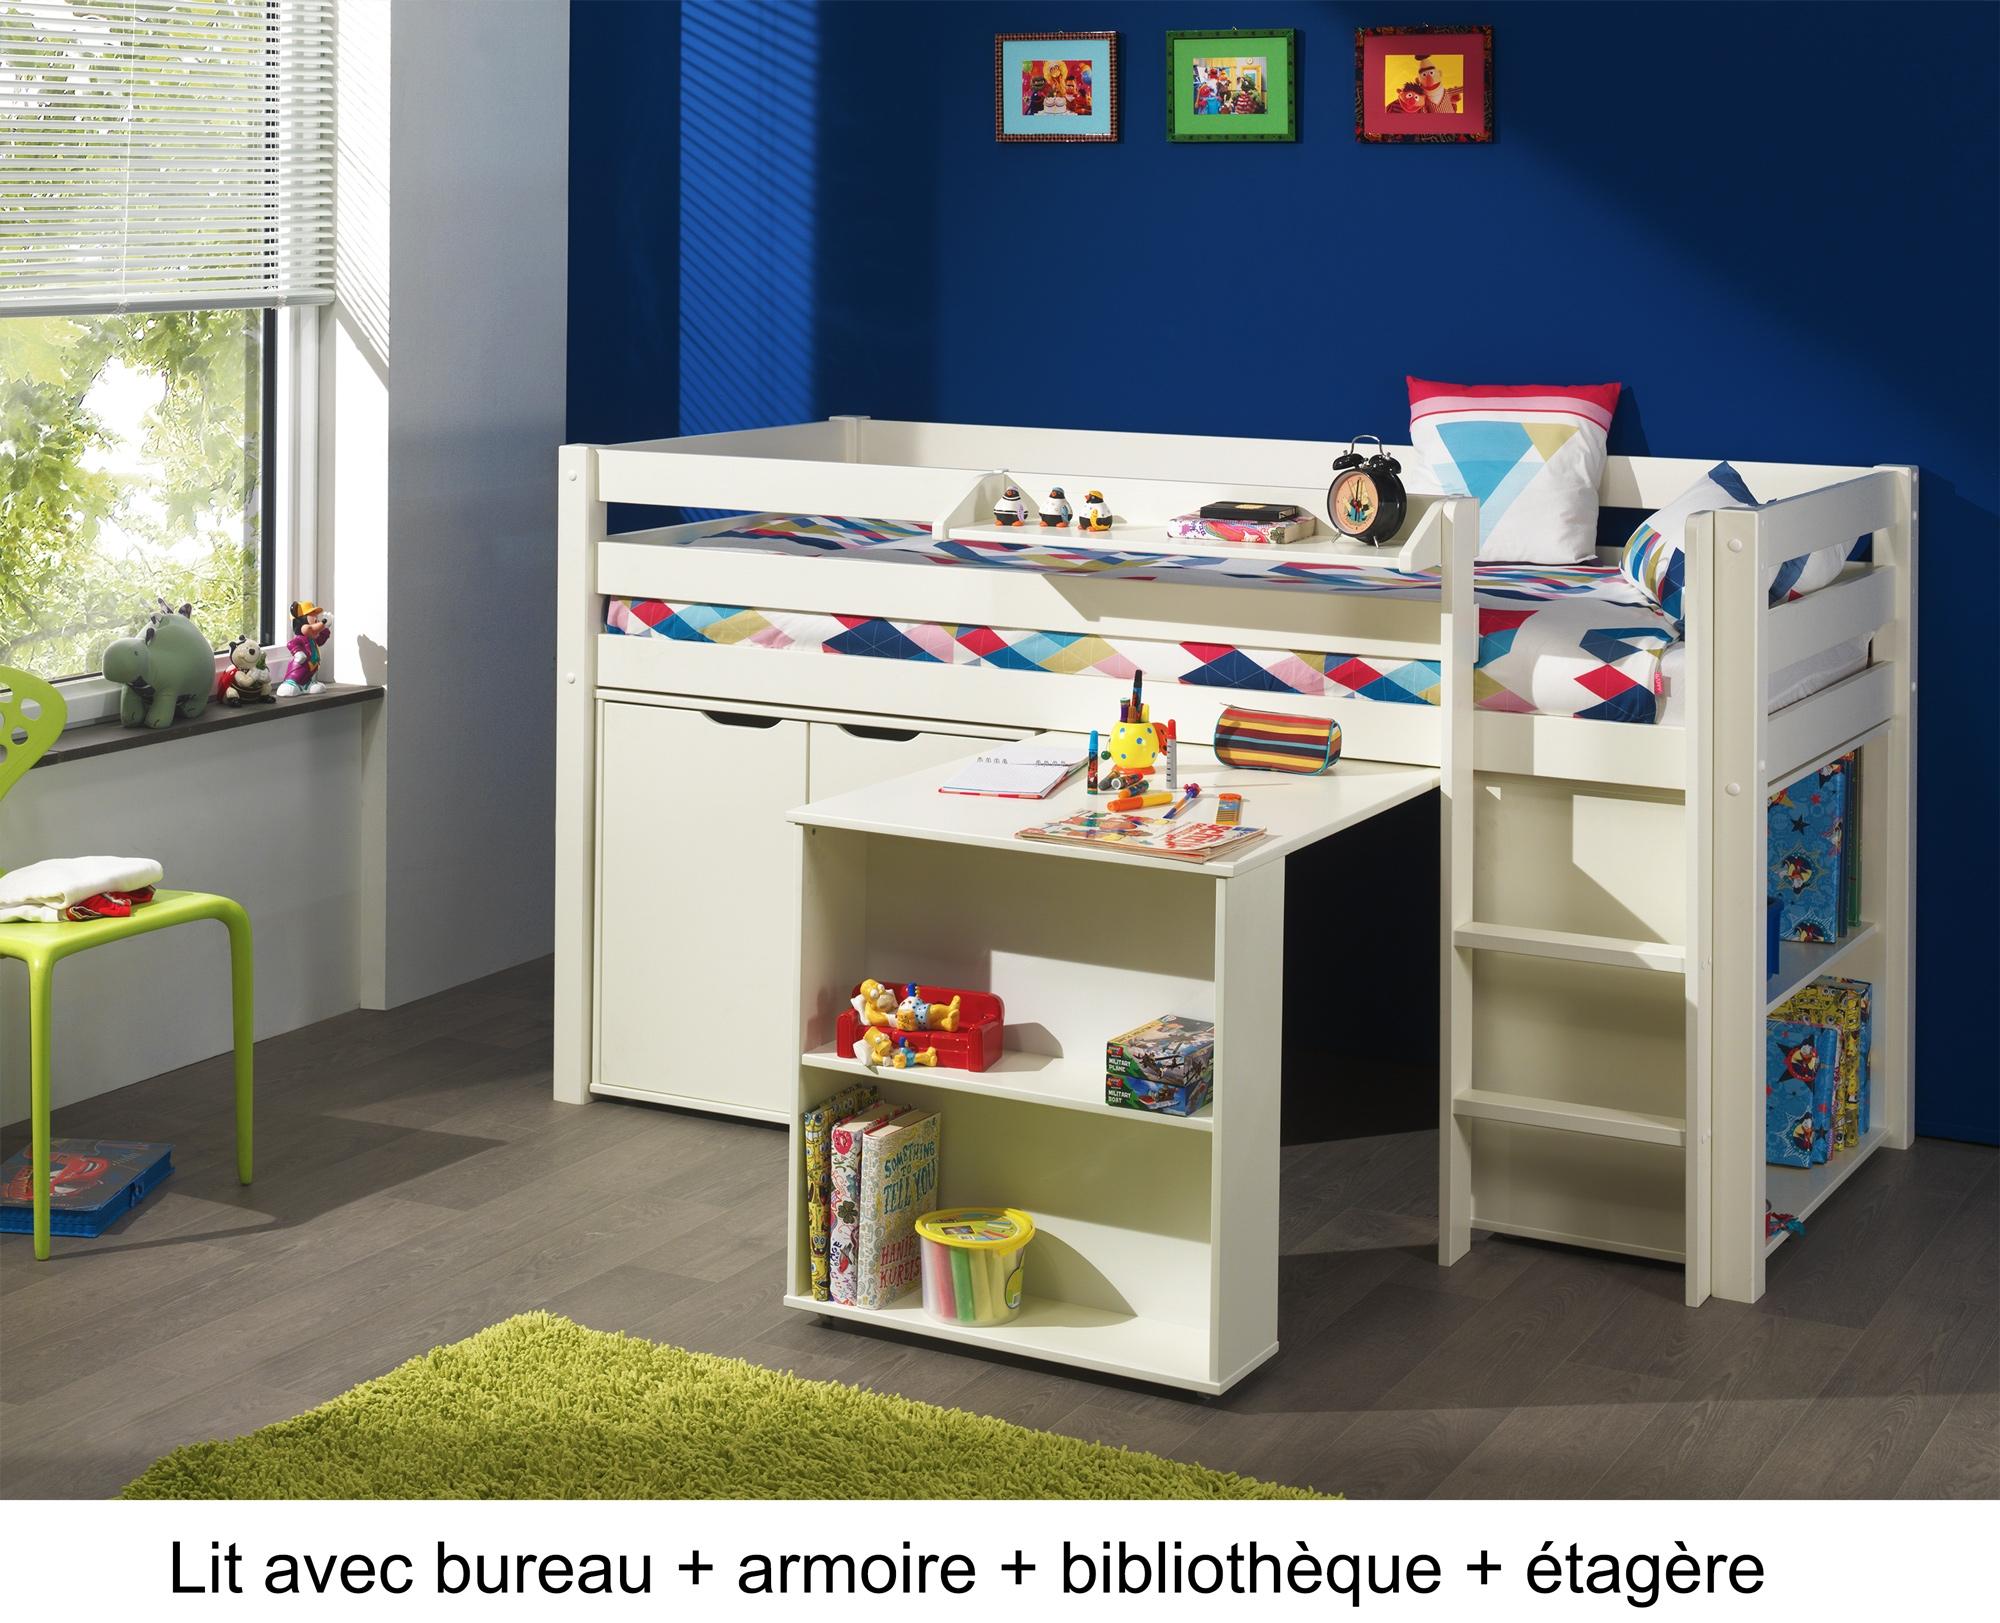 lit enfant combin bureau et rangement theo en pin massif so nuit. Black Bedroom Furniture Sets. Home Design Ideas